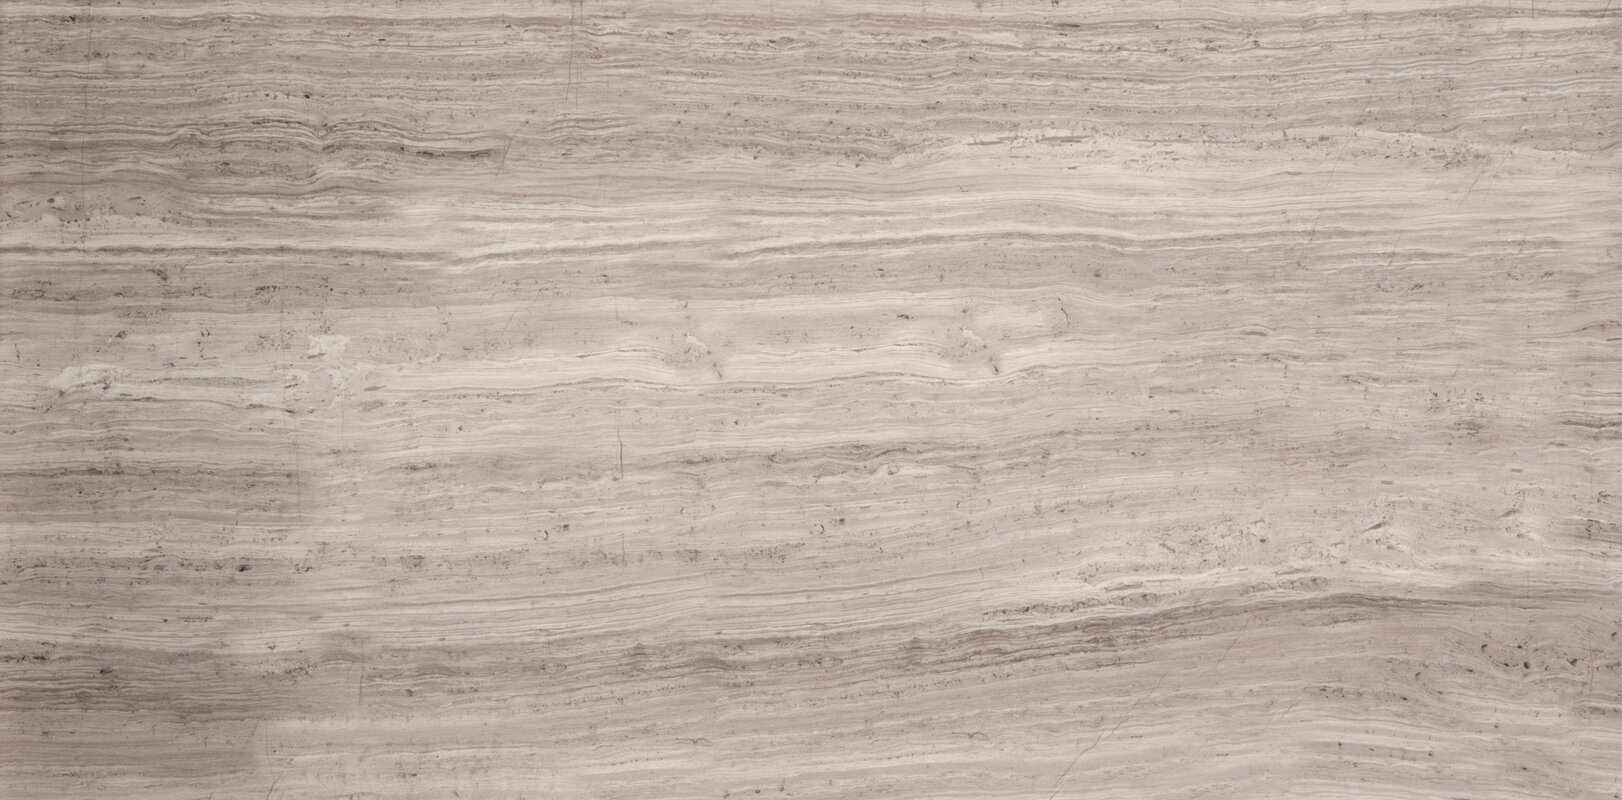 Emser tile metro 4 x 10 limestone tile in gray vein cut honed metro 4 x 10 limestone tile in gray vein dailygadgetfo Choice Image